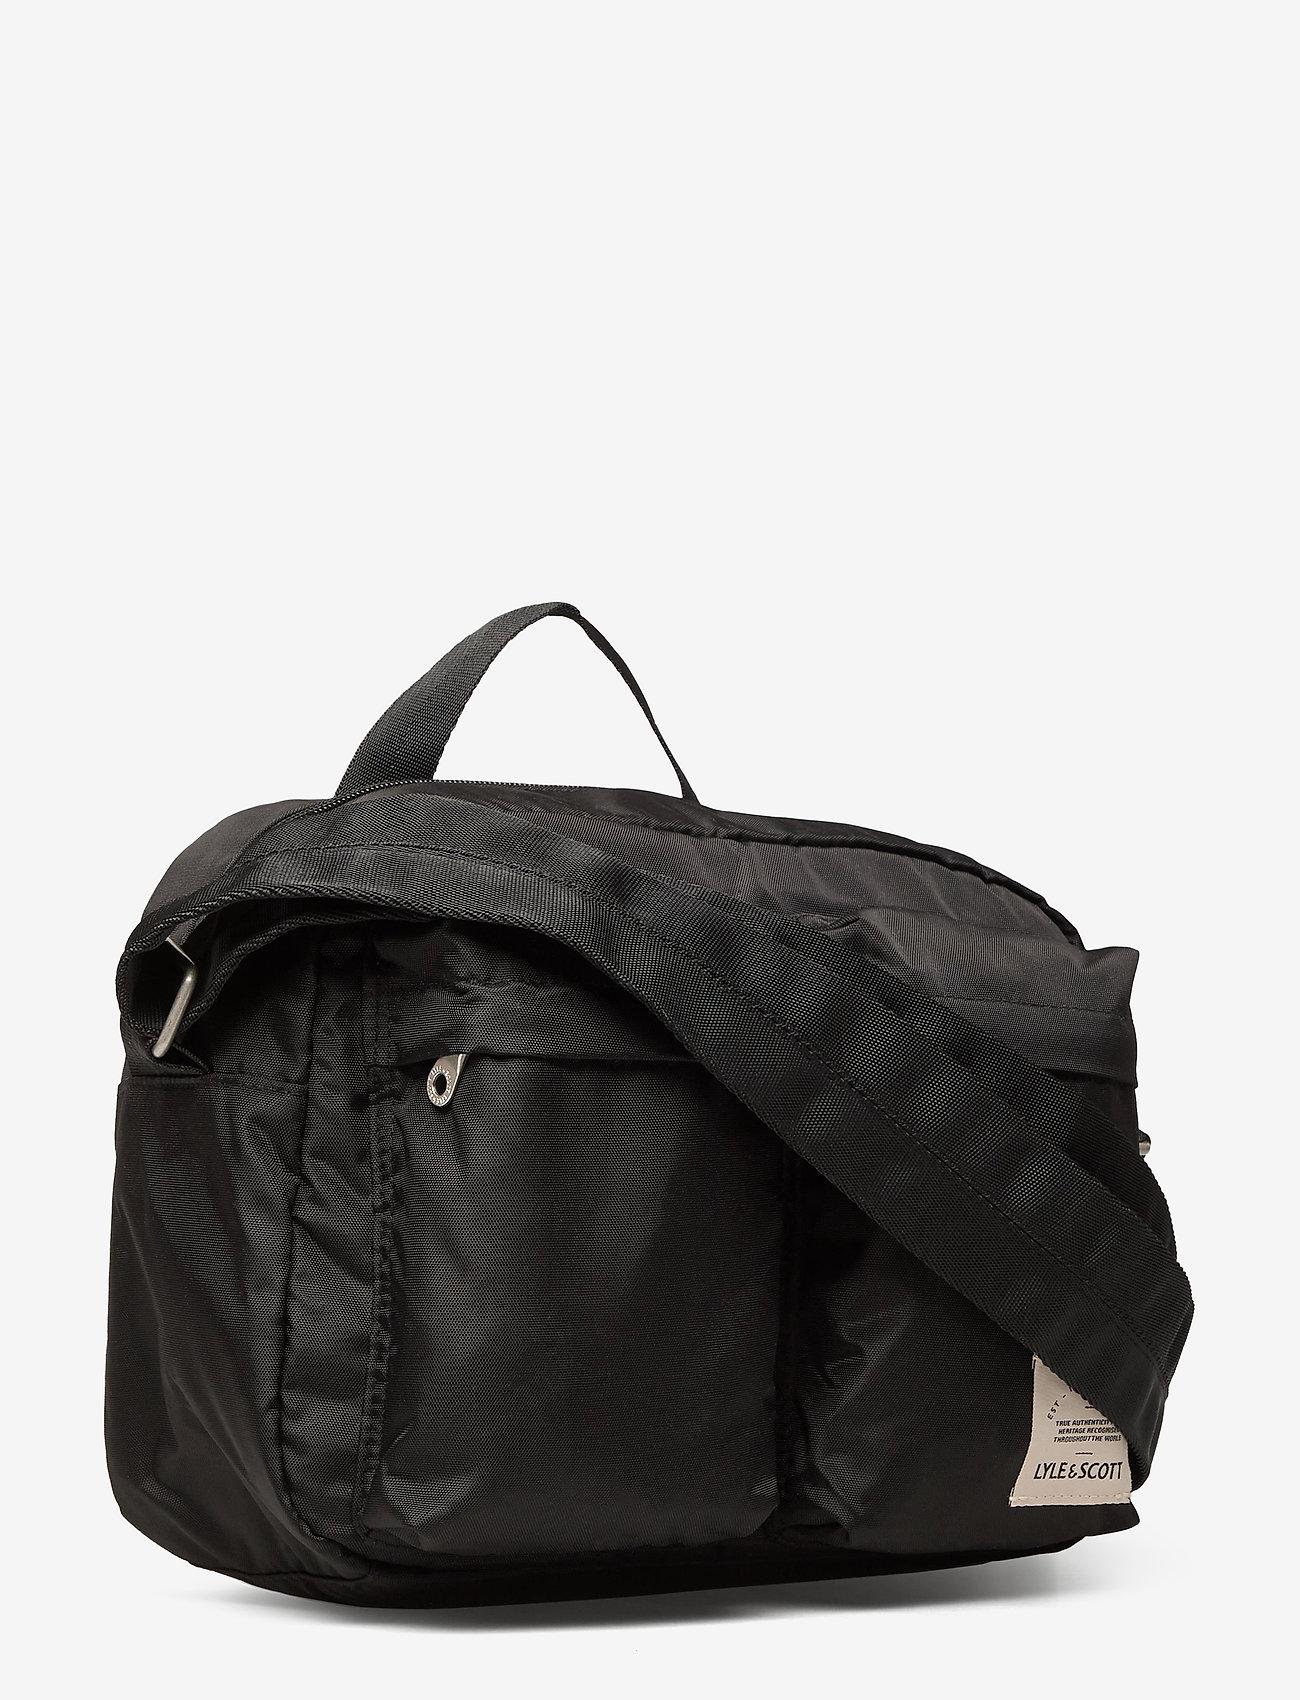 Lyle & Scott Nylon Camera Bag - Torby na ramię TRUE BLACK - Torby